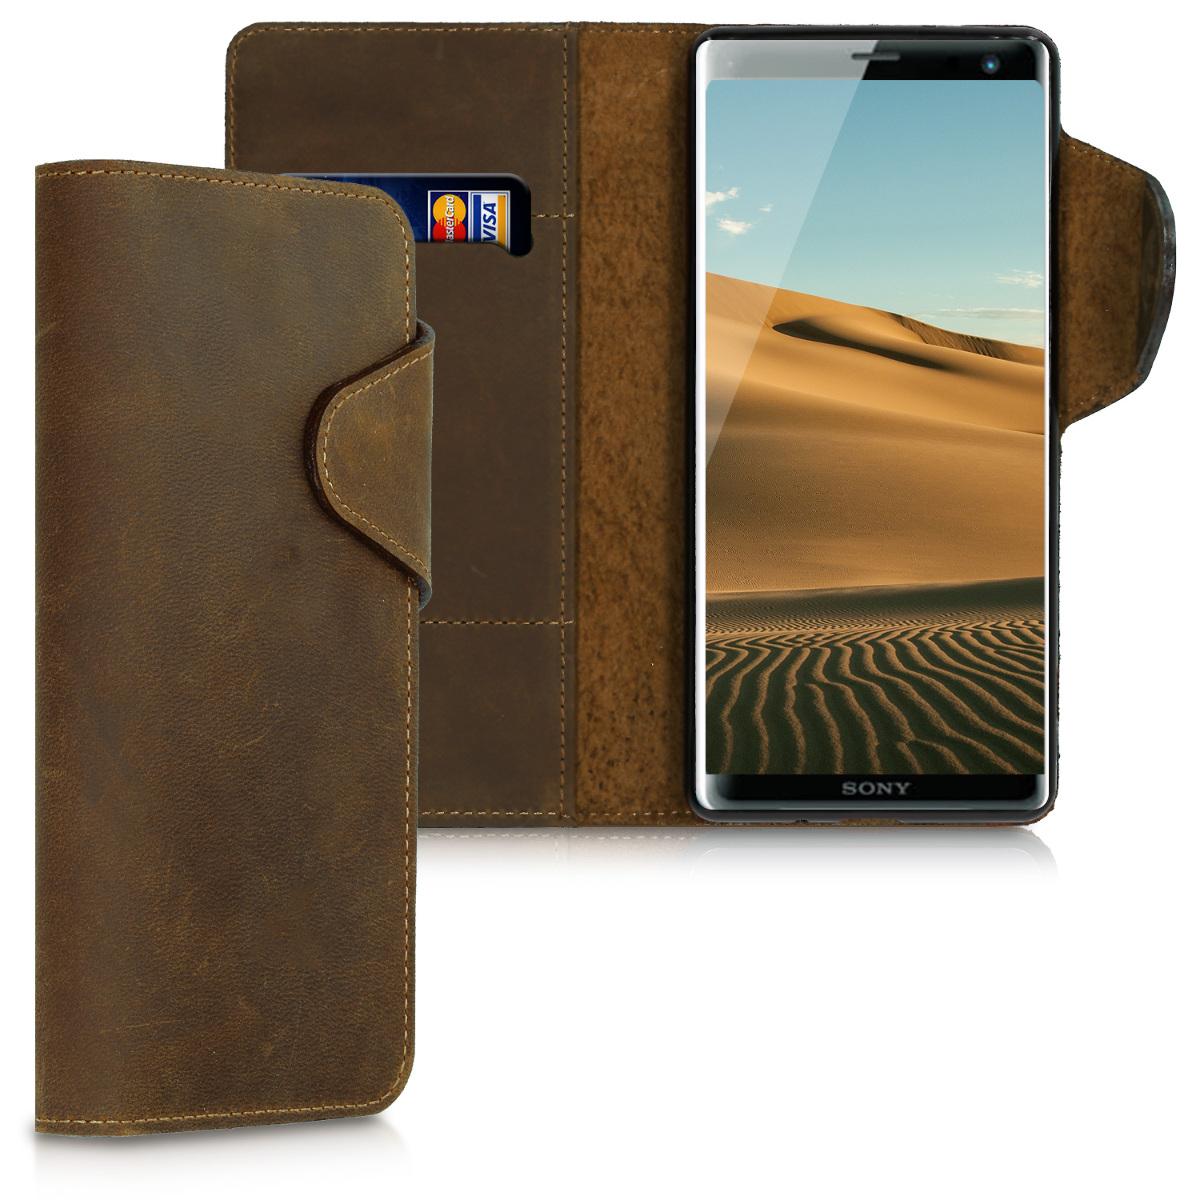 Kalibri Δερμάτινη Suede Θήκη - Πορτοφόλι Sony Xperia XZ3 - Brown (45963.05)